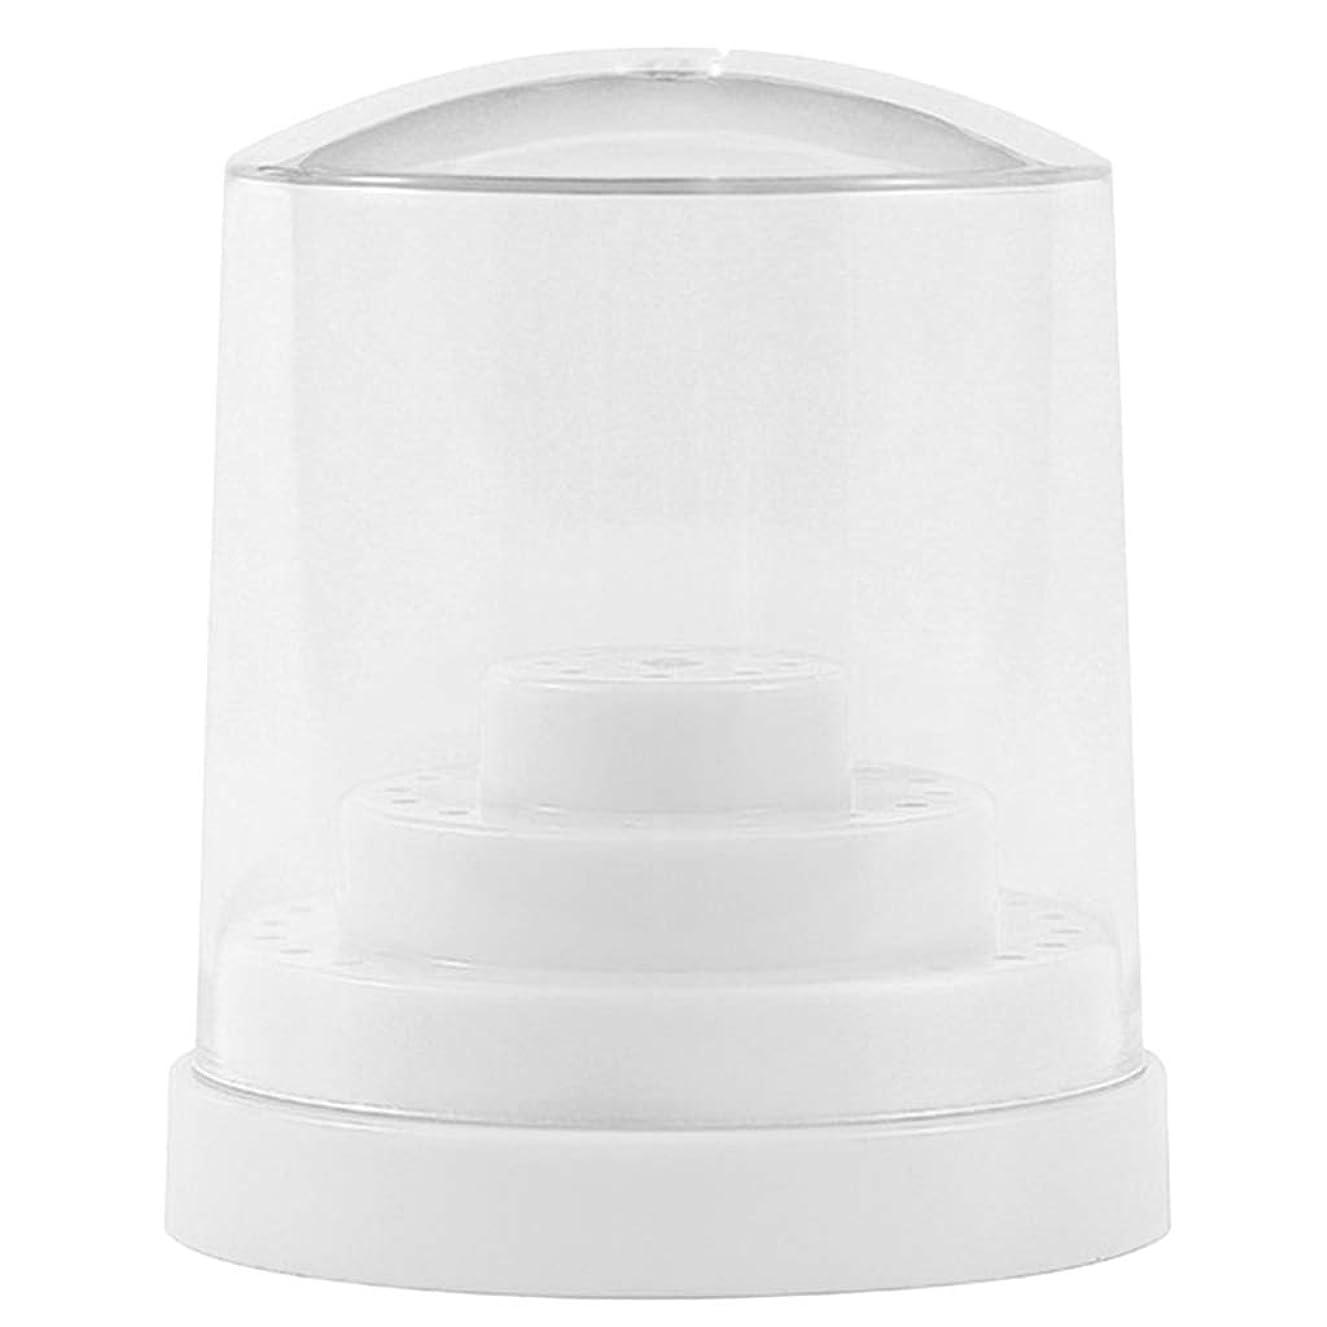 Perfeclan 三層48穴 ネイルドリルビットホルダー アクリル製 ネイルマシーン用ビットスタンド 防塵 全2色 - ホワイト